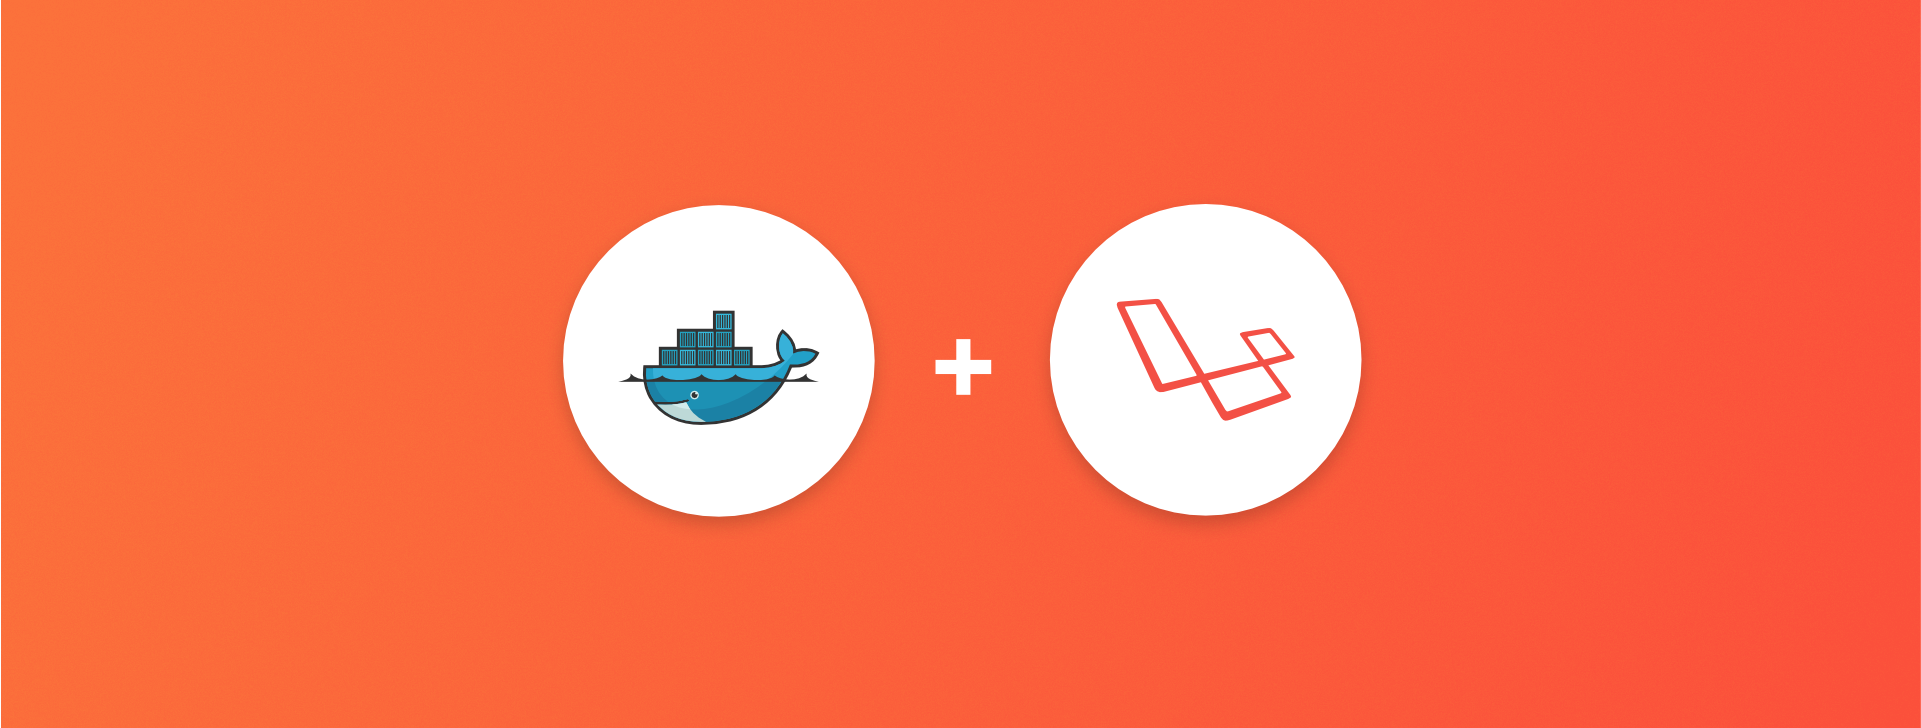 Laravel in Docker - By